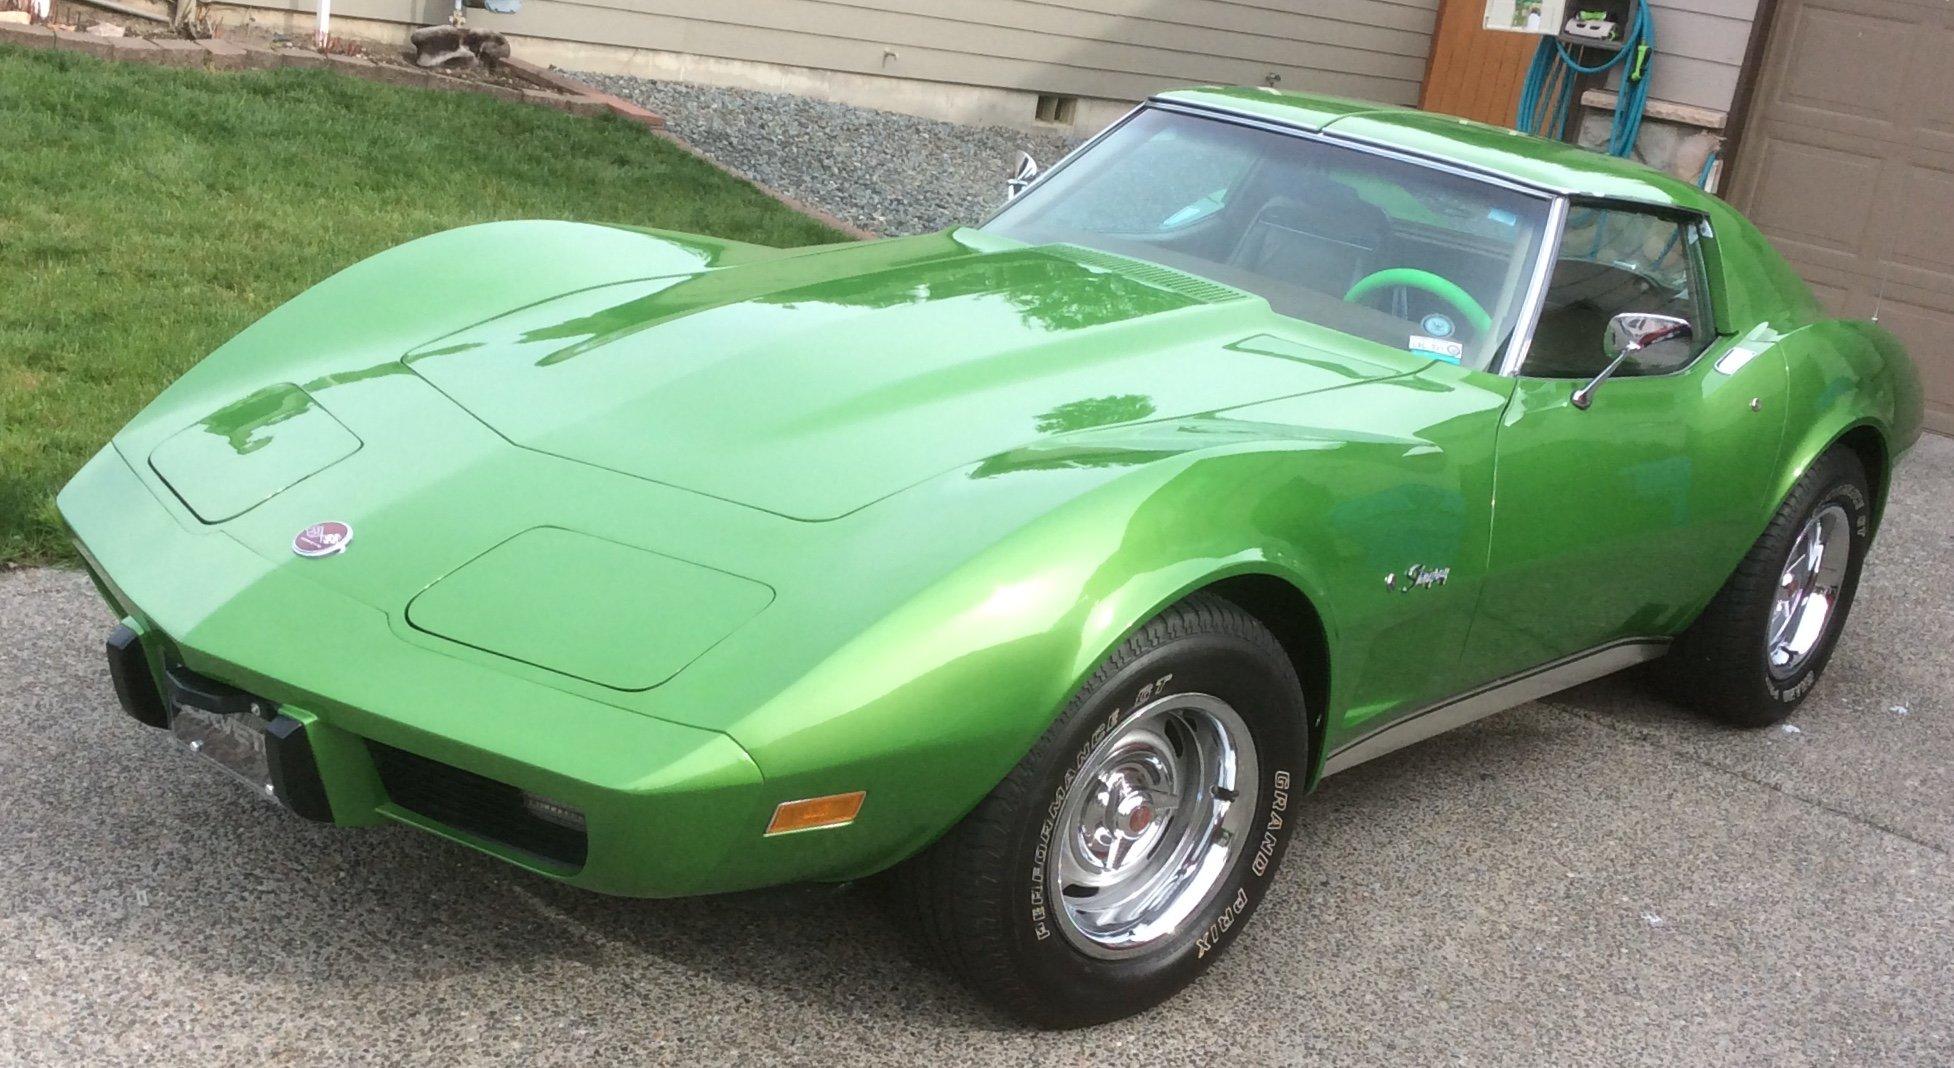 1975 Chevrolet Corvette Coupe For Sale (picture 1 of 4)